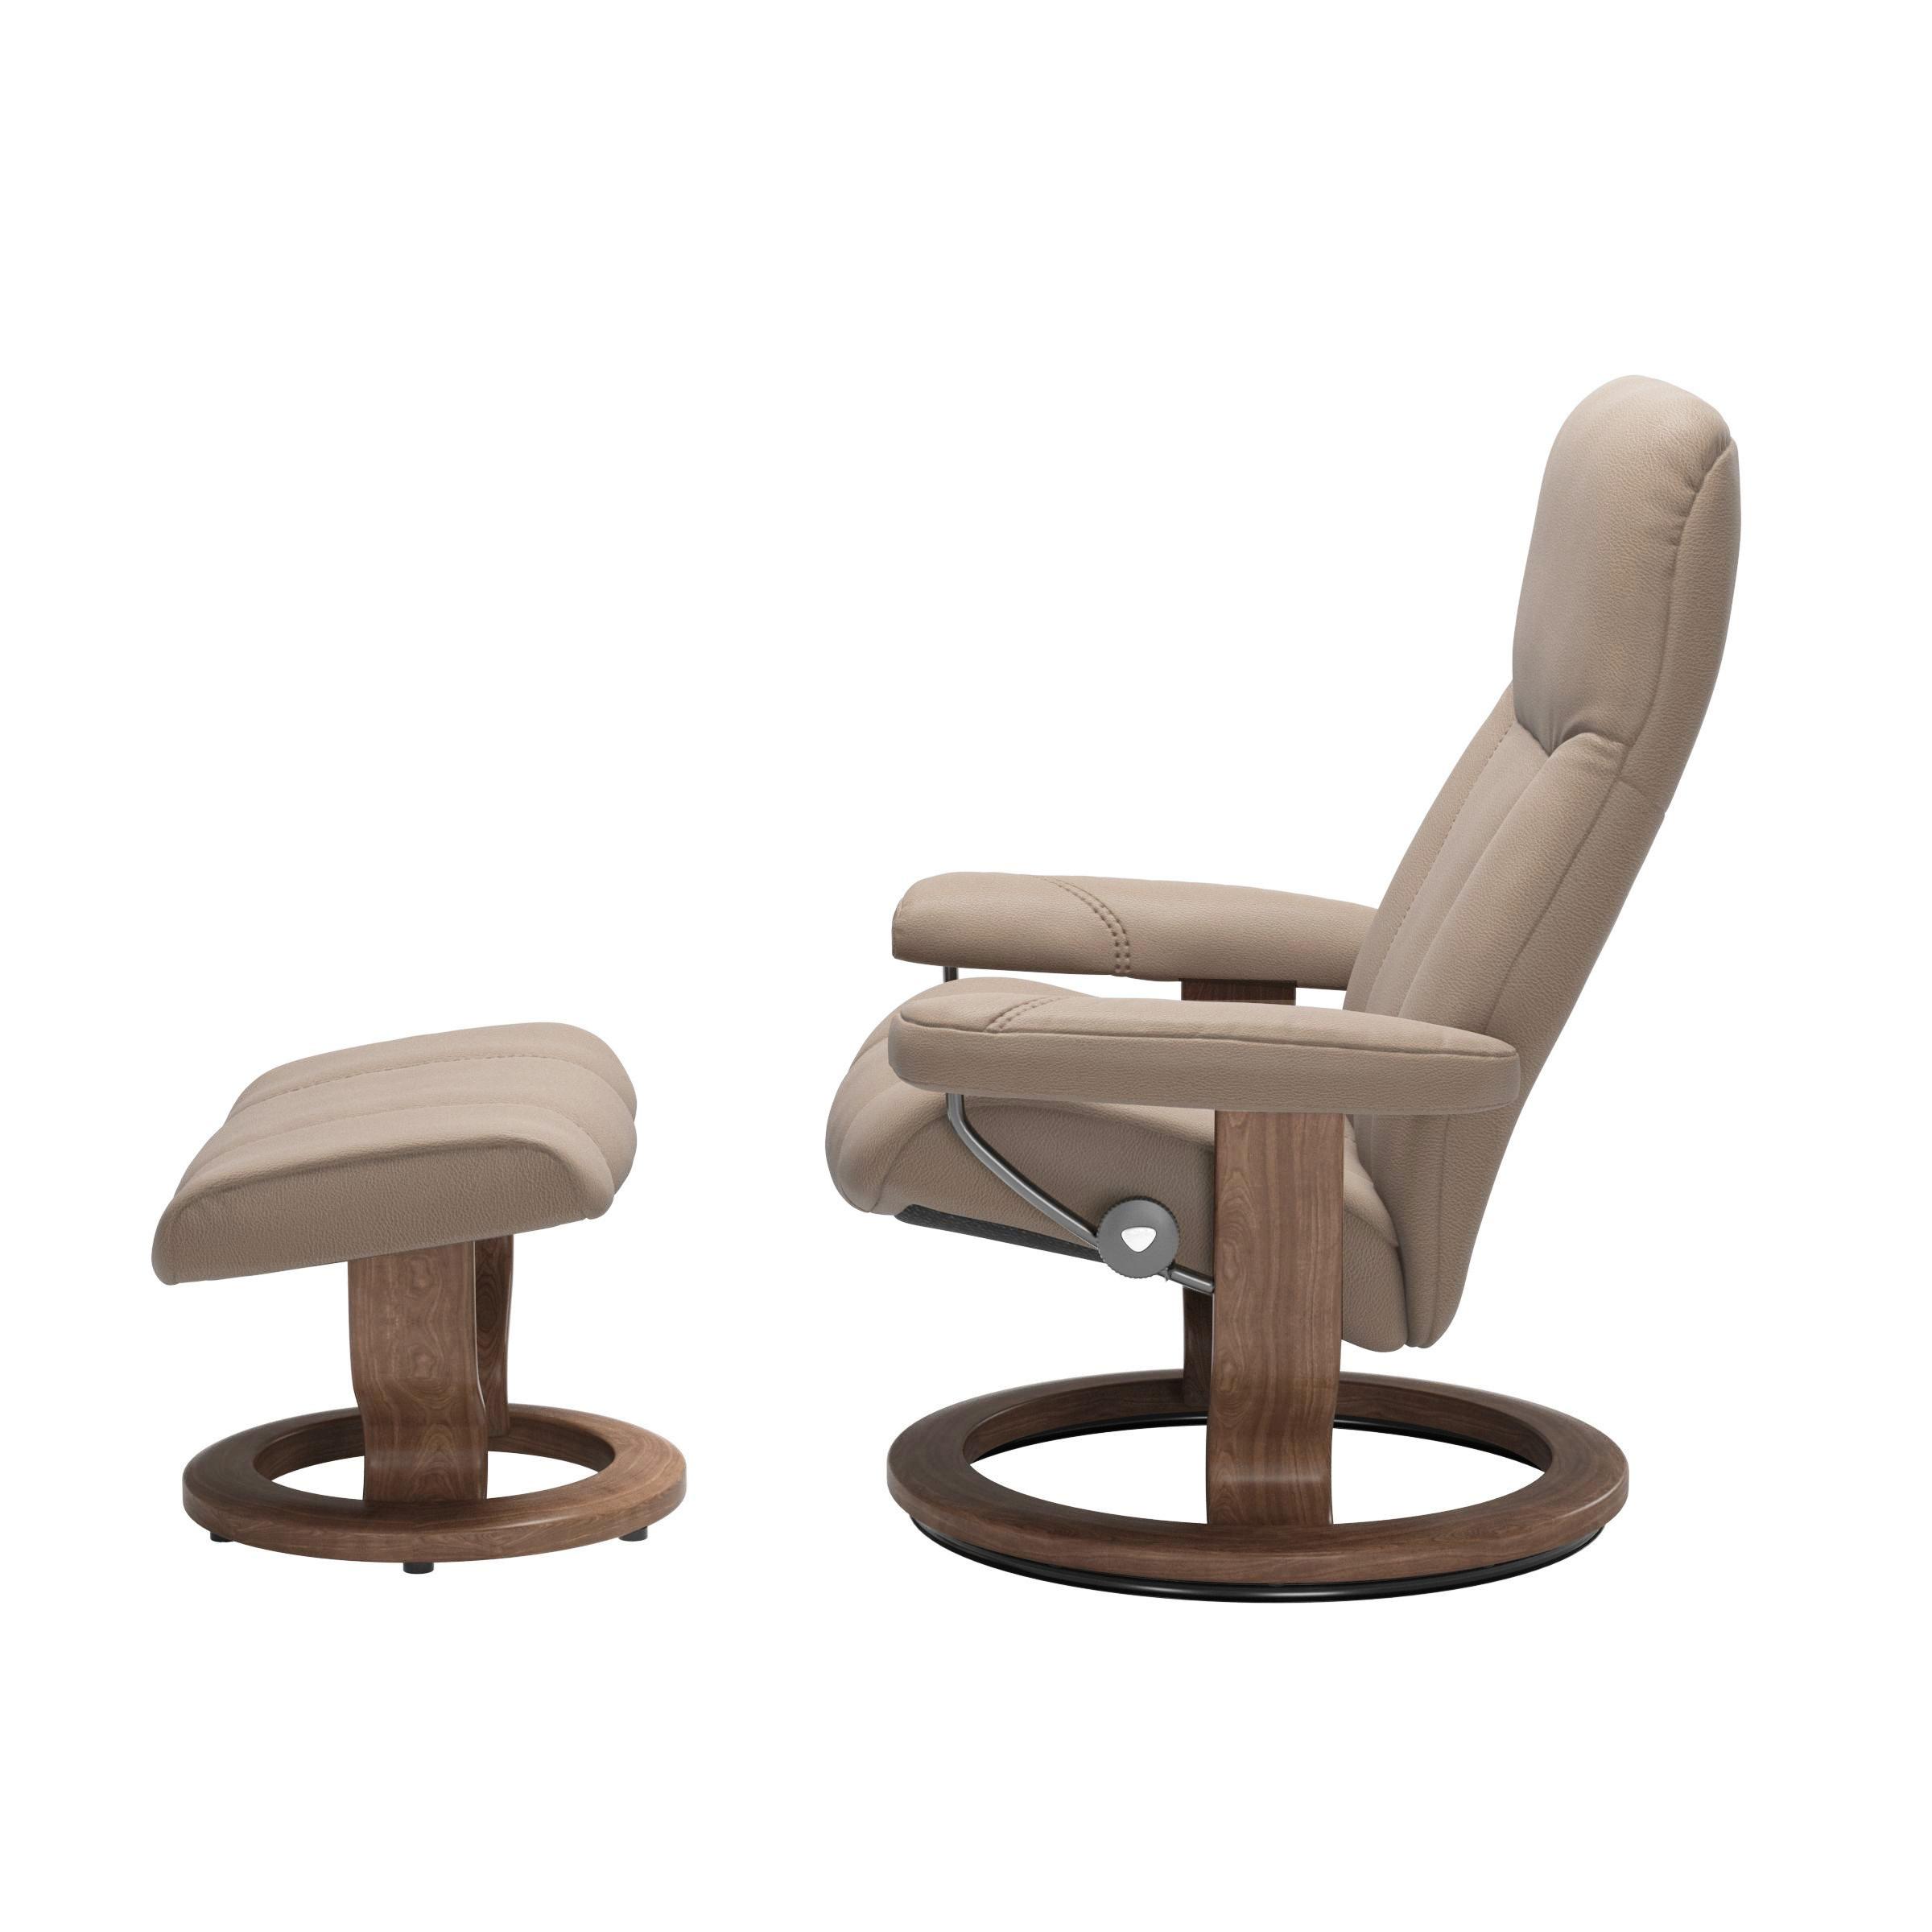 Stressless Consul Mole Medium Recliner Chair